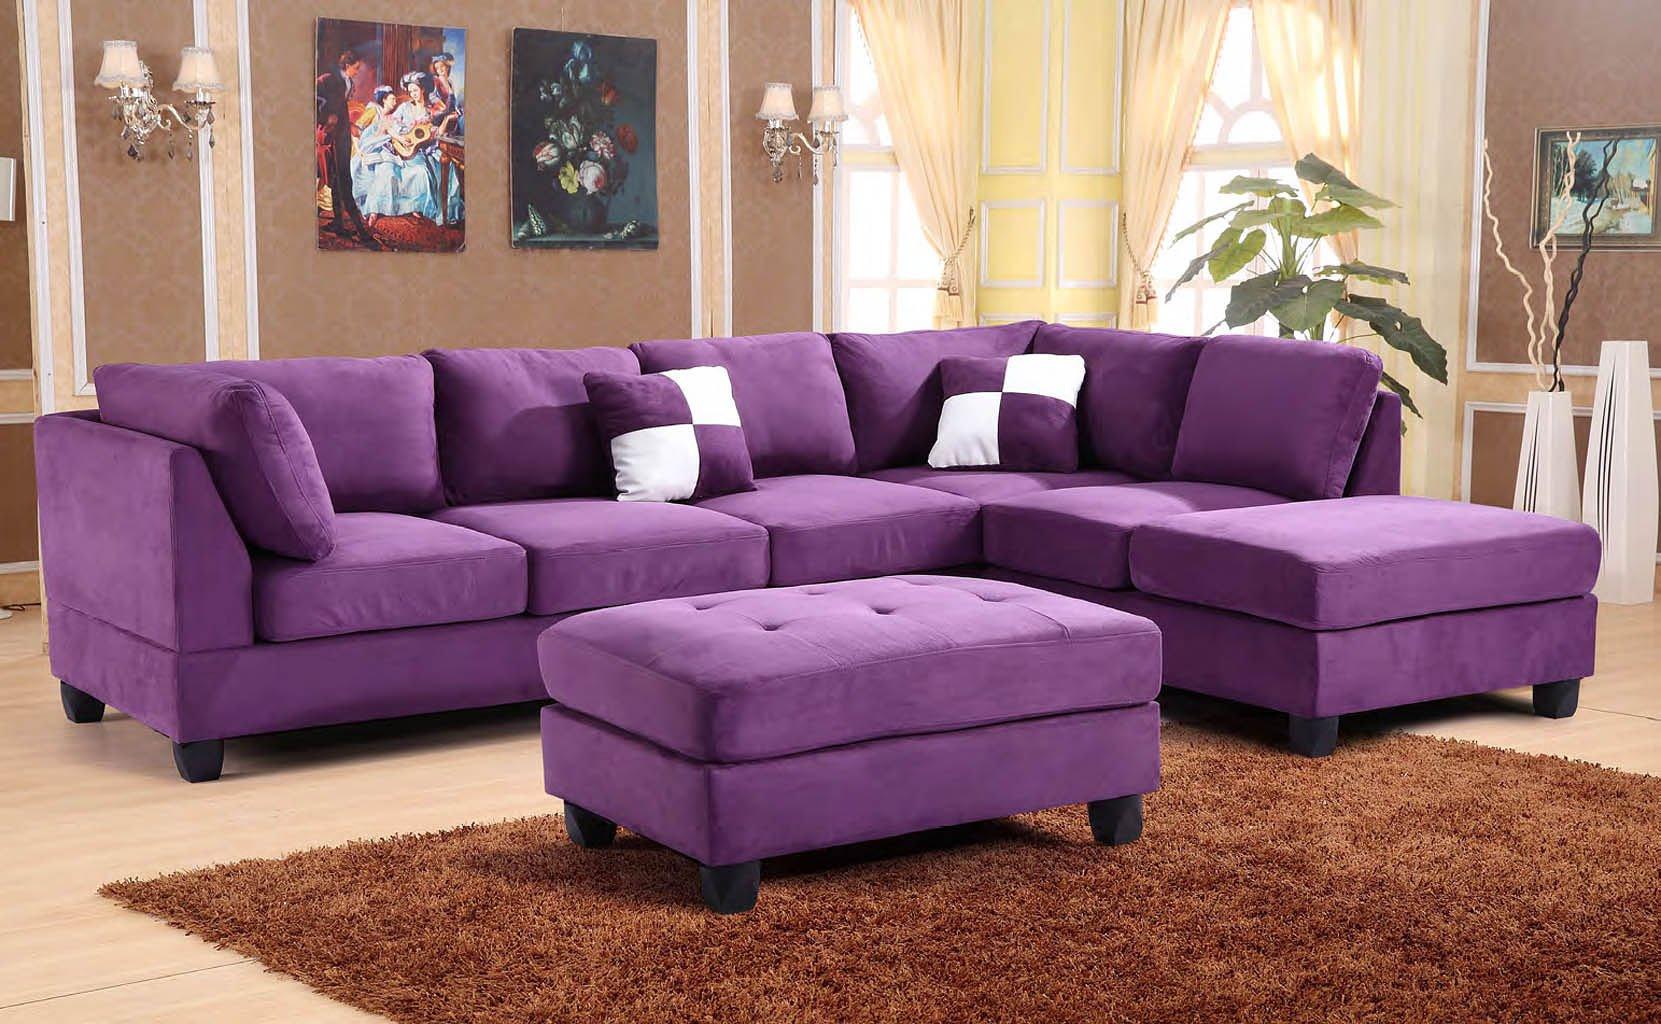 G637 Reversible Sectional Set Purple Living Room Sets